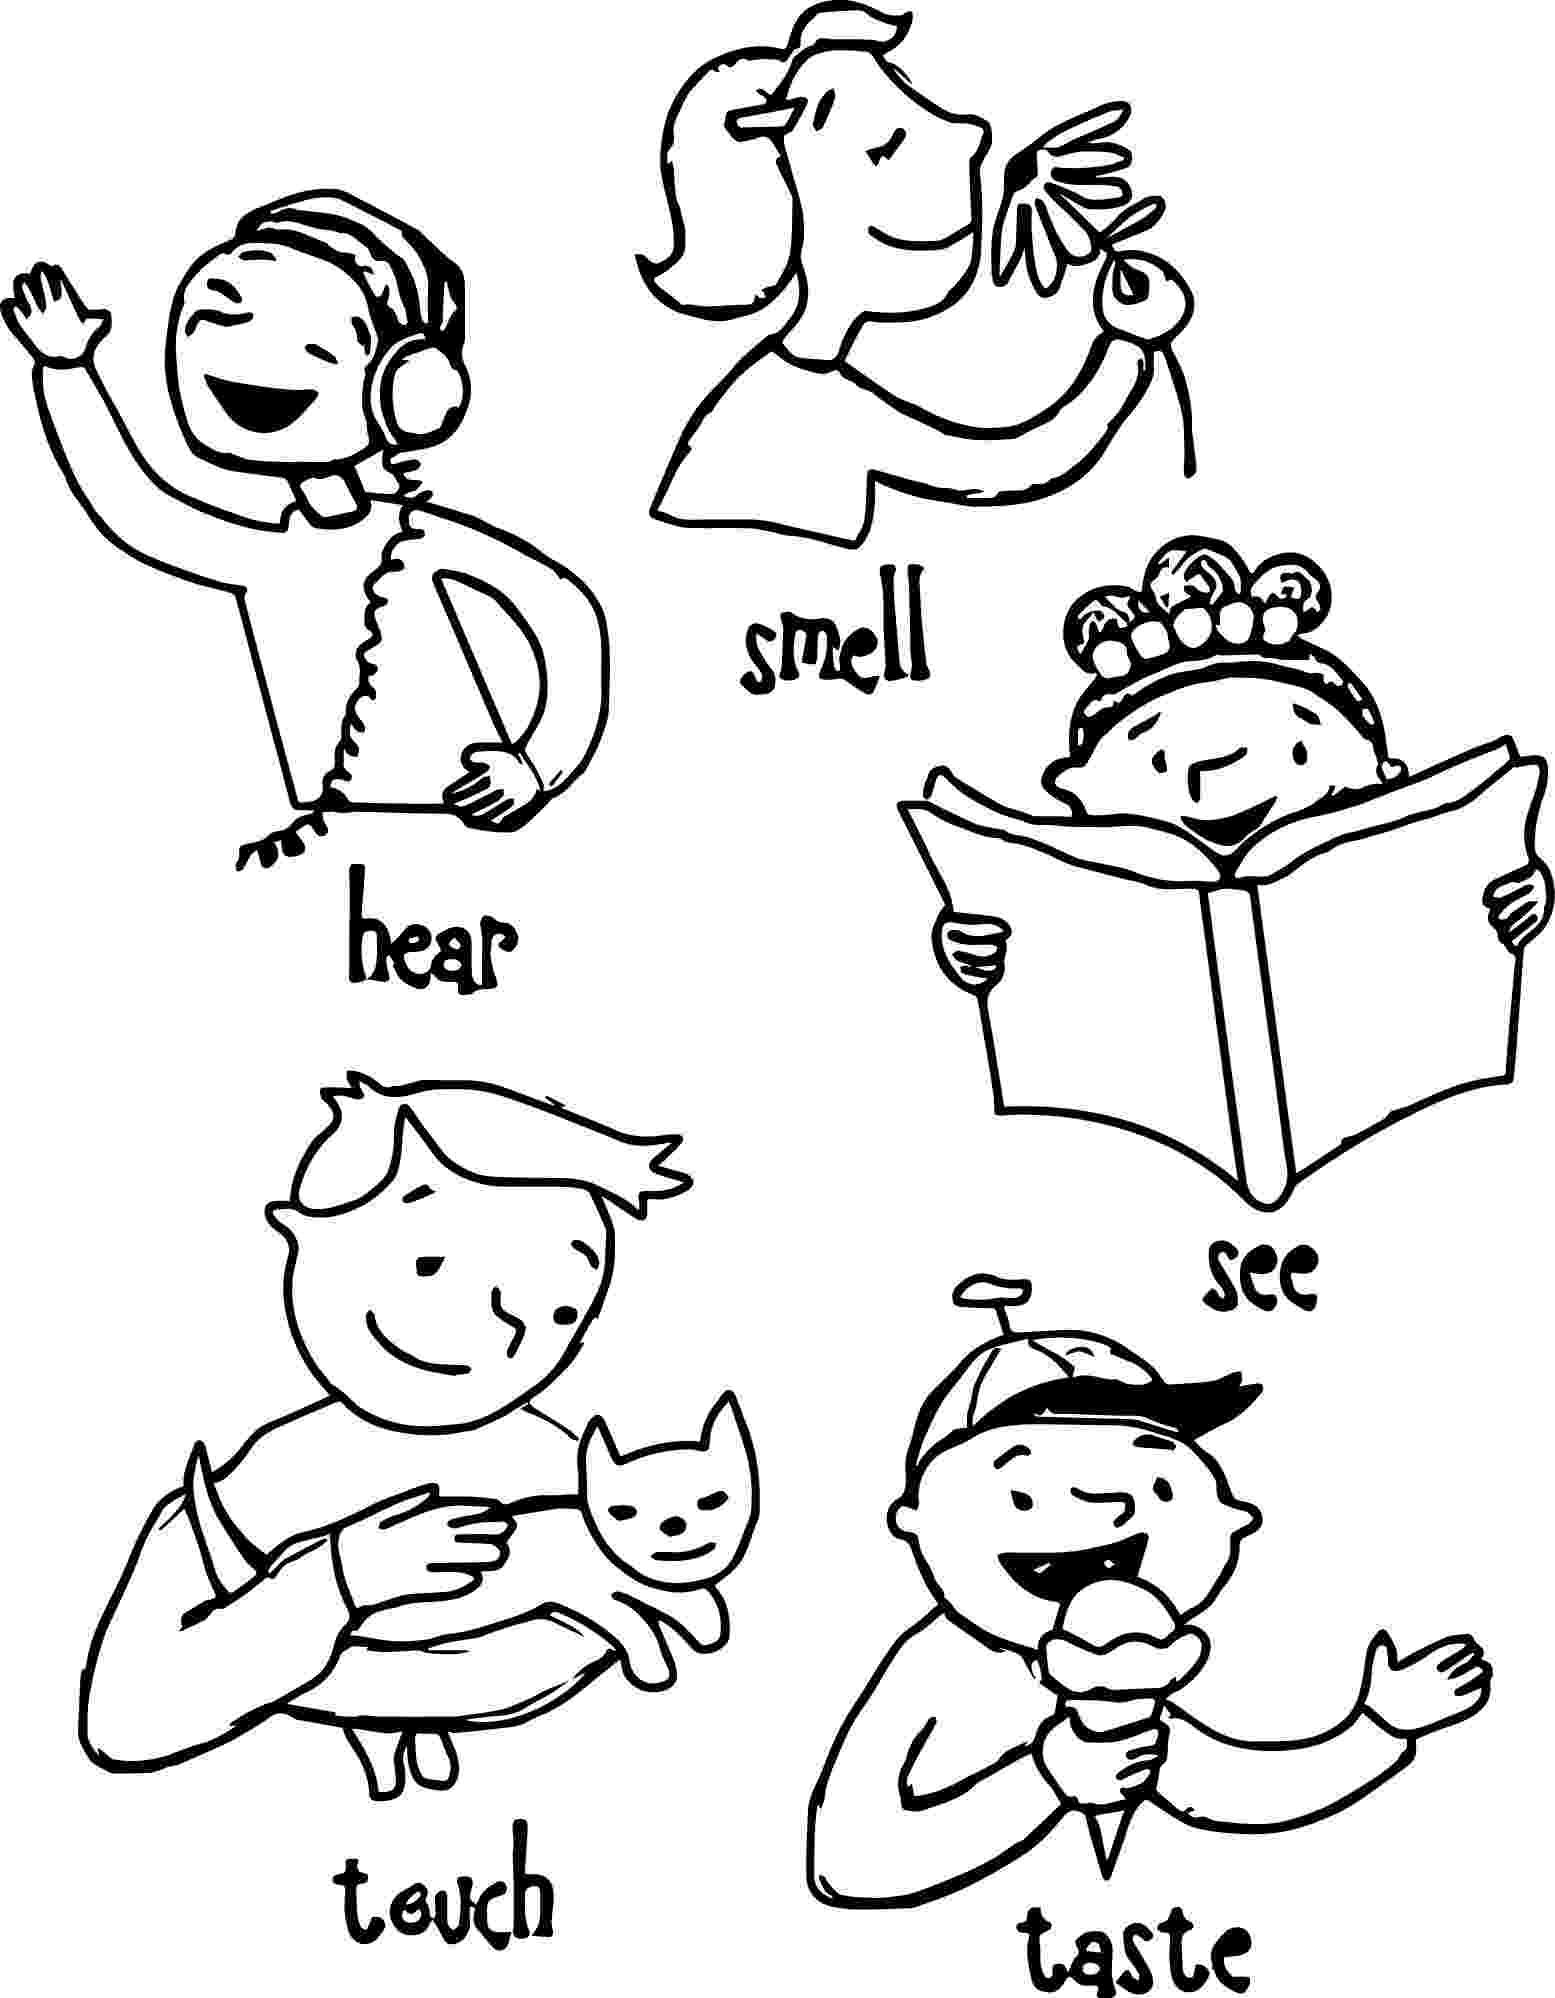 five senses coloring pages five senses coloring pages coloring home pages coloring senses five